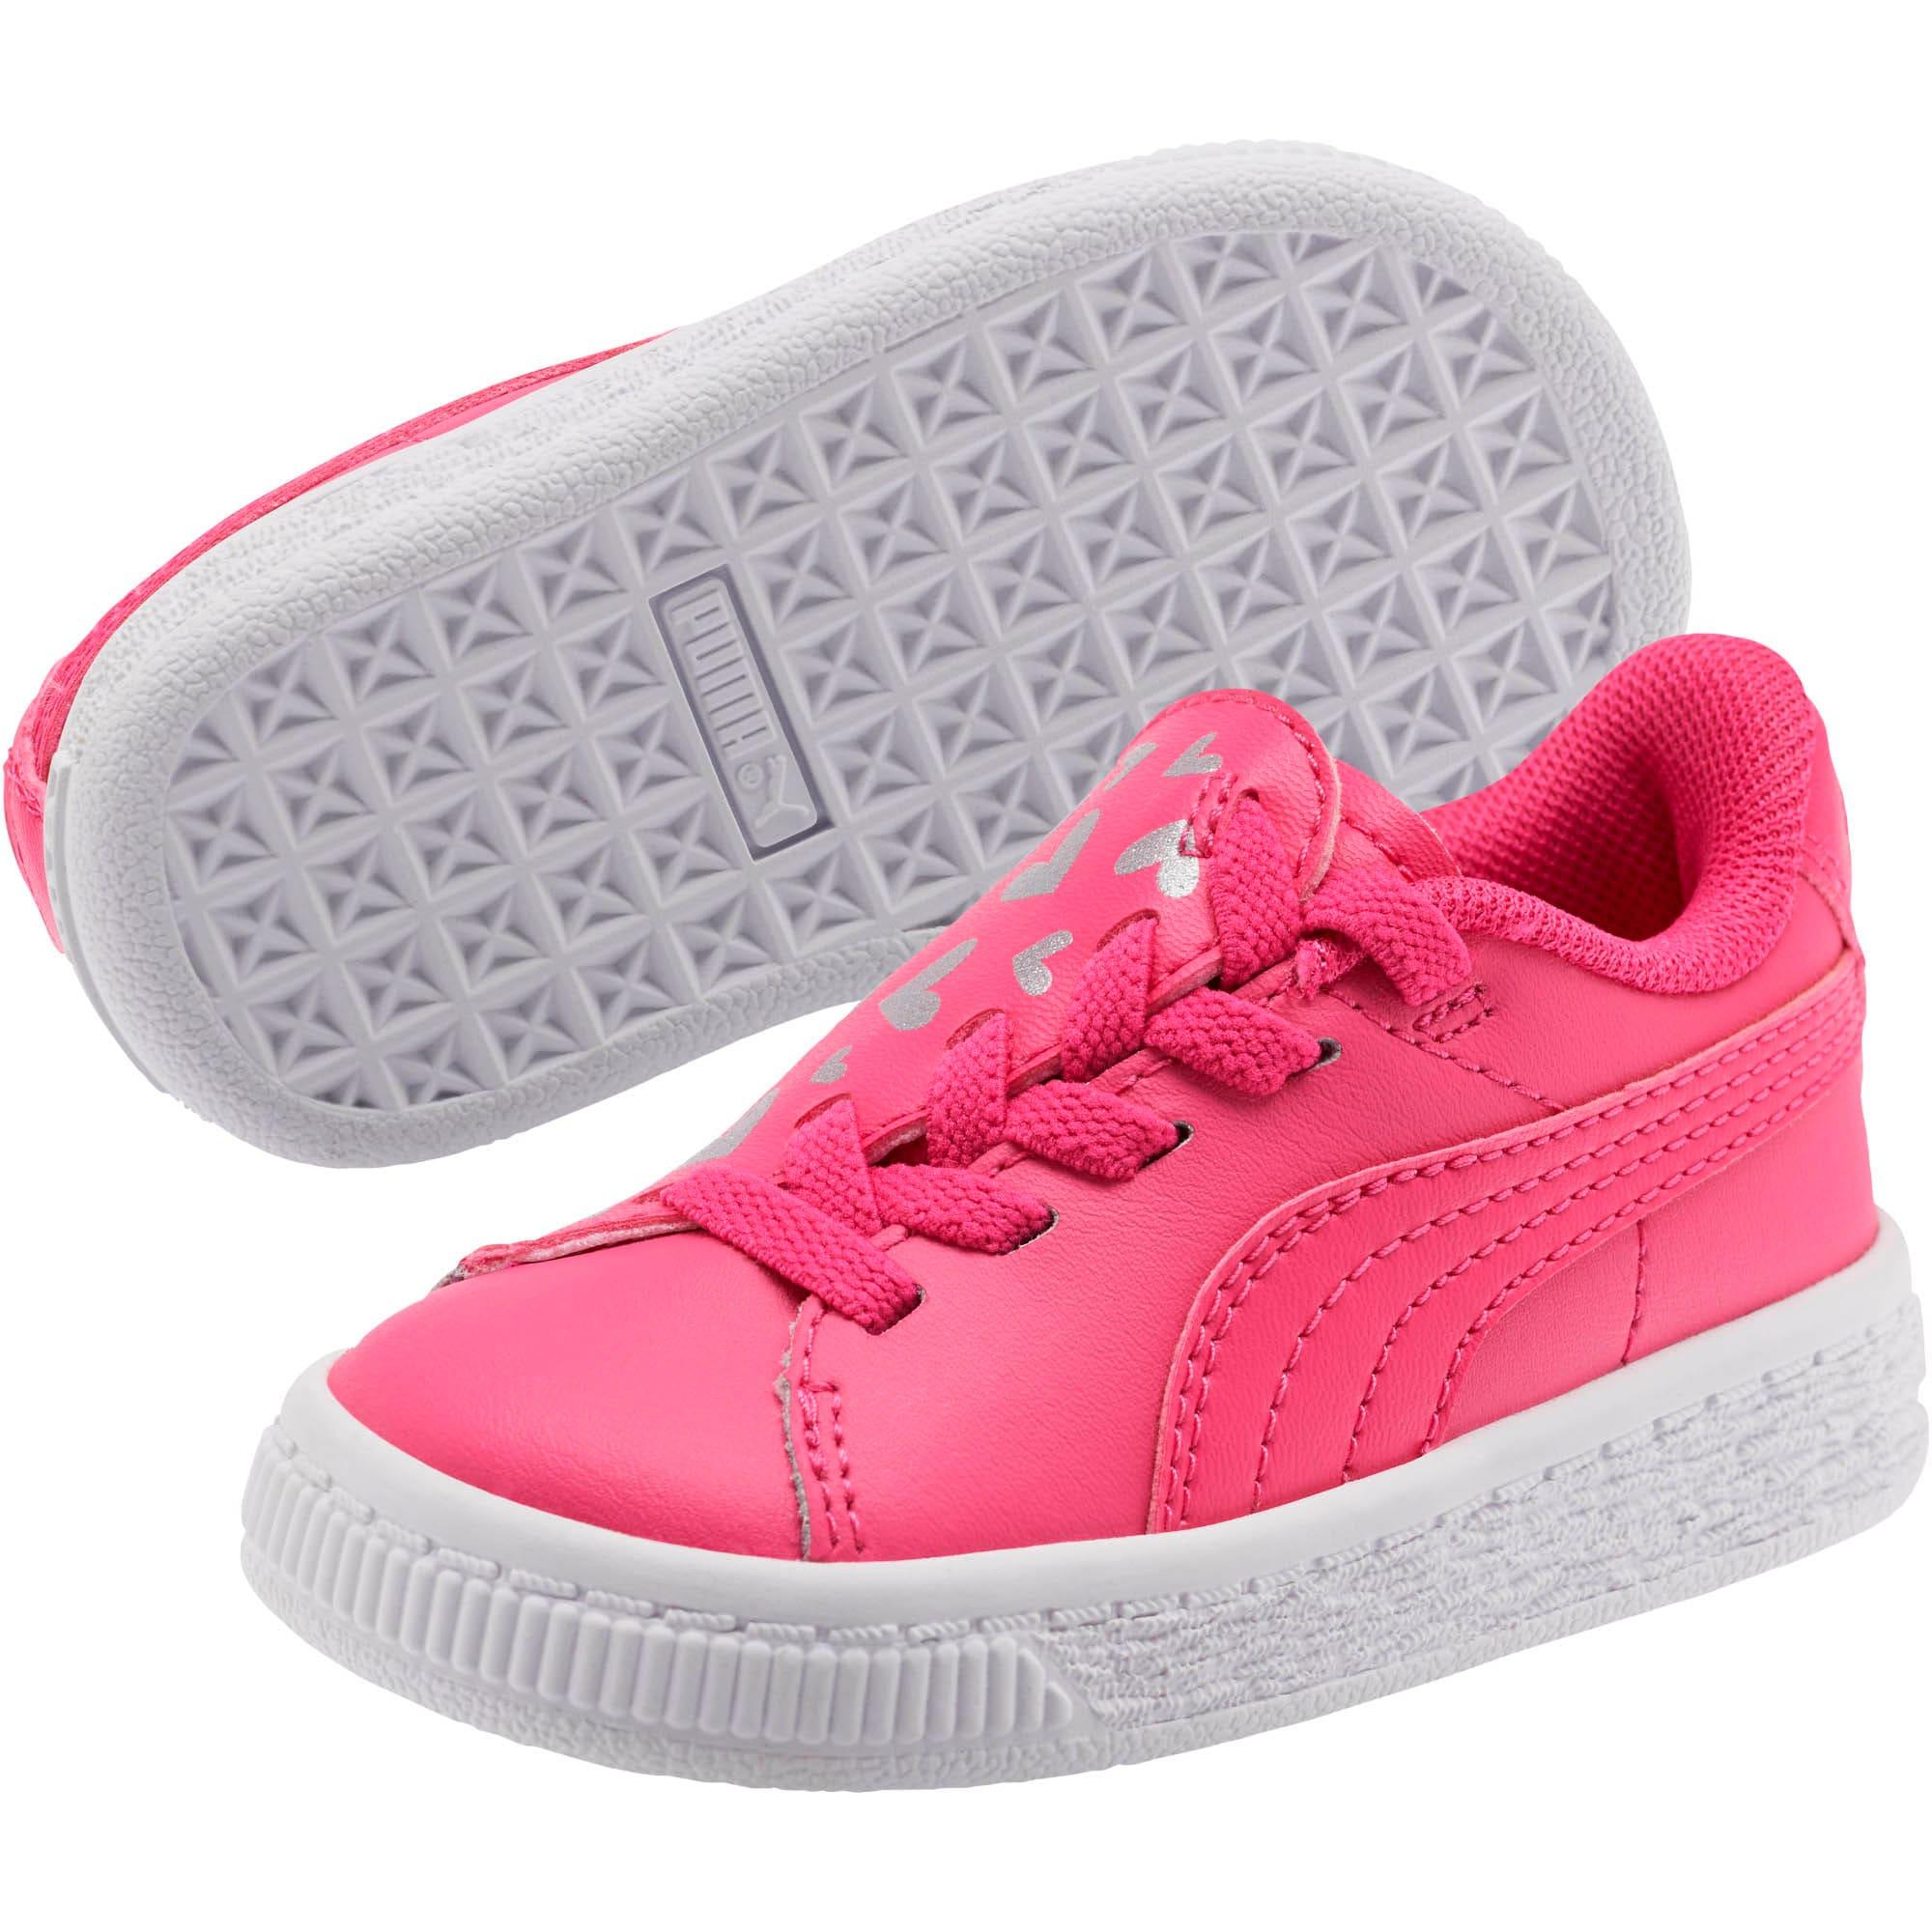 Thumbnail 3 of Basket Crush Glitter Hearts AC Toddler Shoes, Fuchsia Purple-Puma White, medium